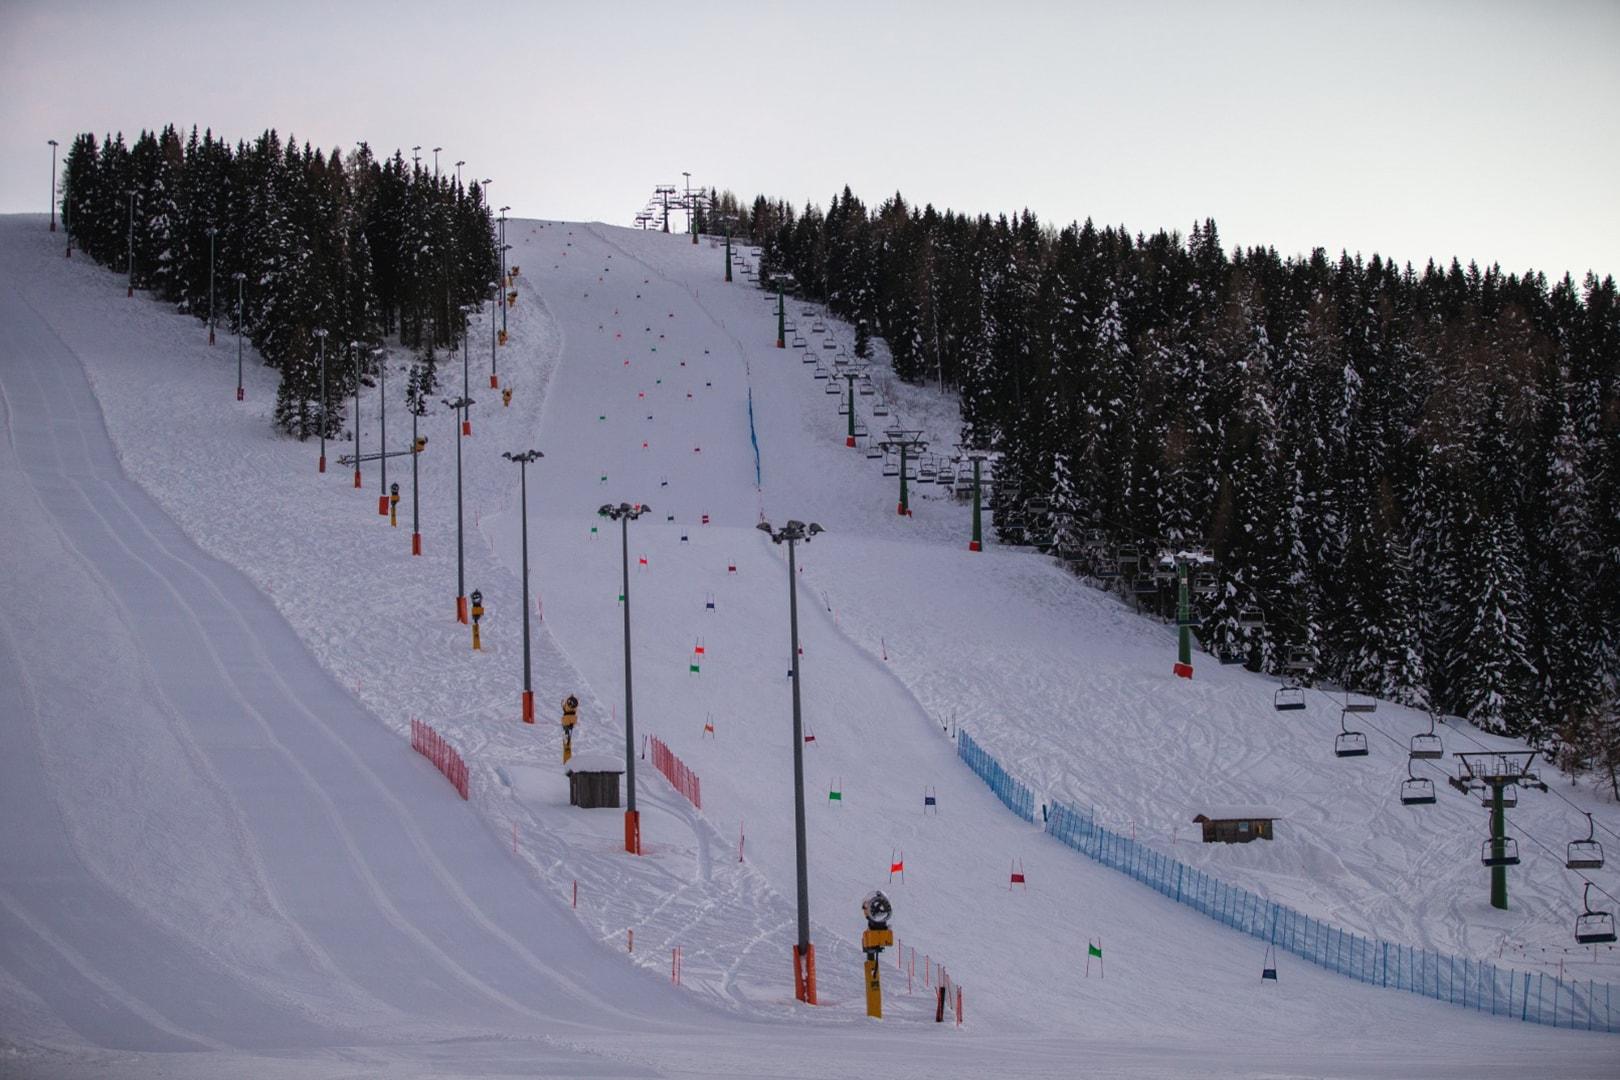 ski area Funivie Lagorai a Passo Brocon 3